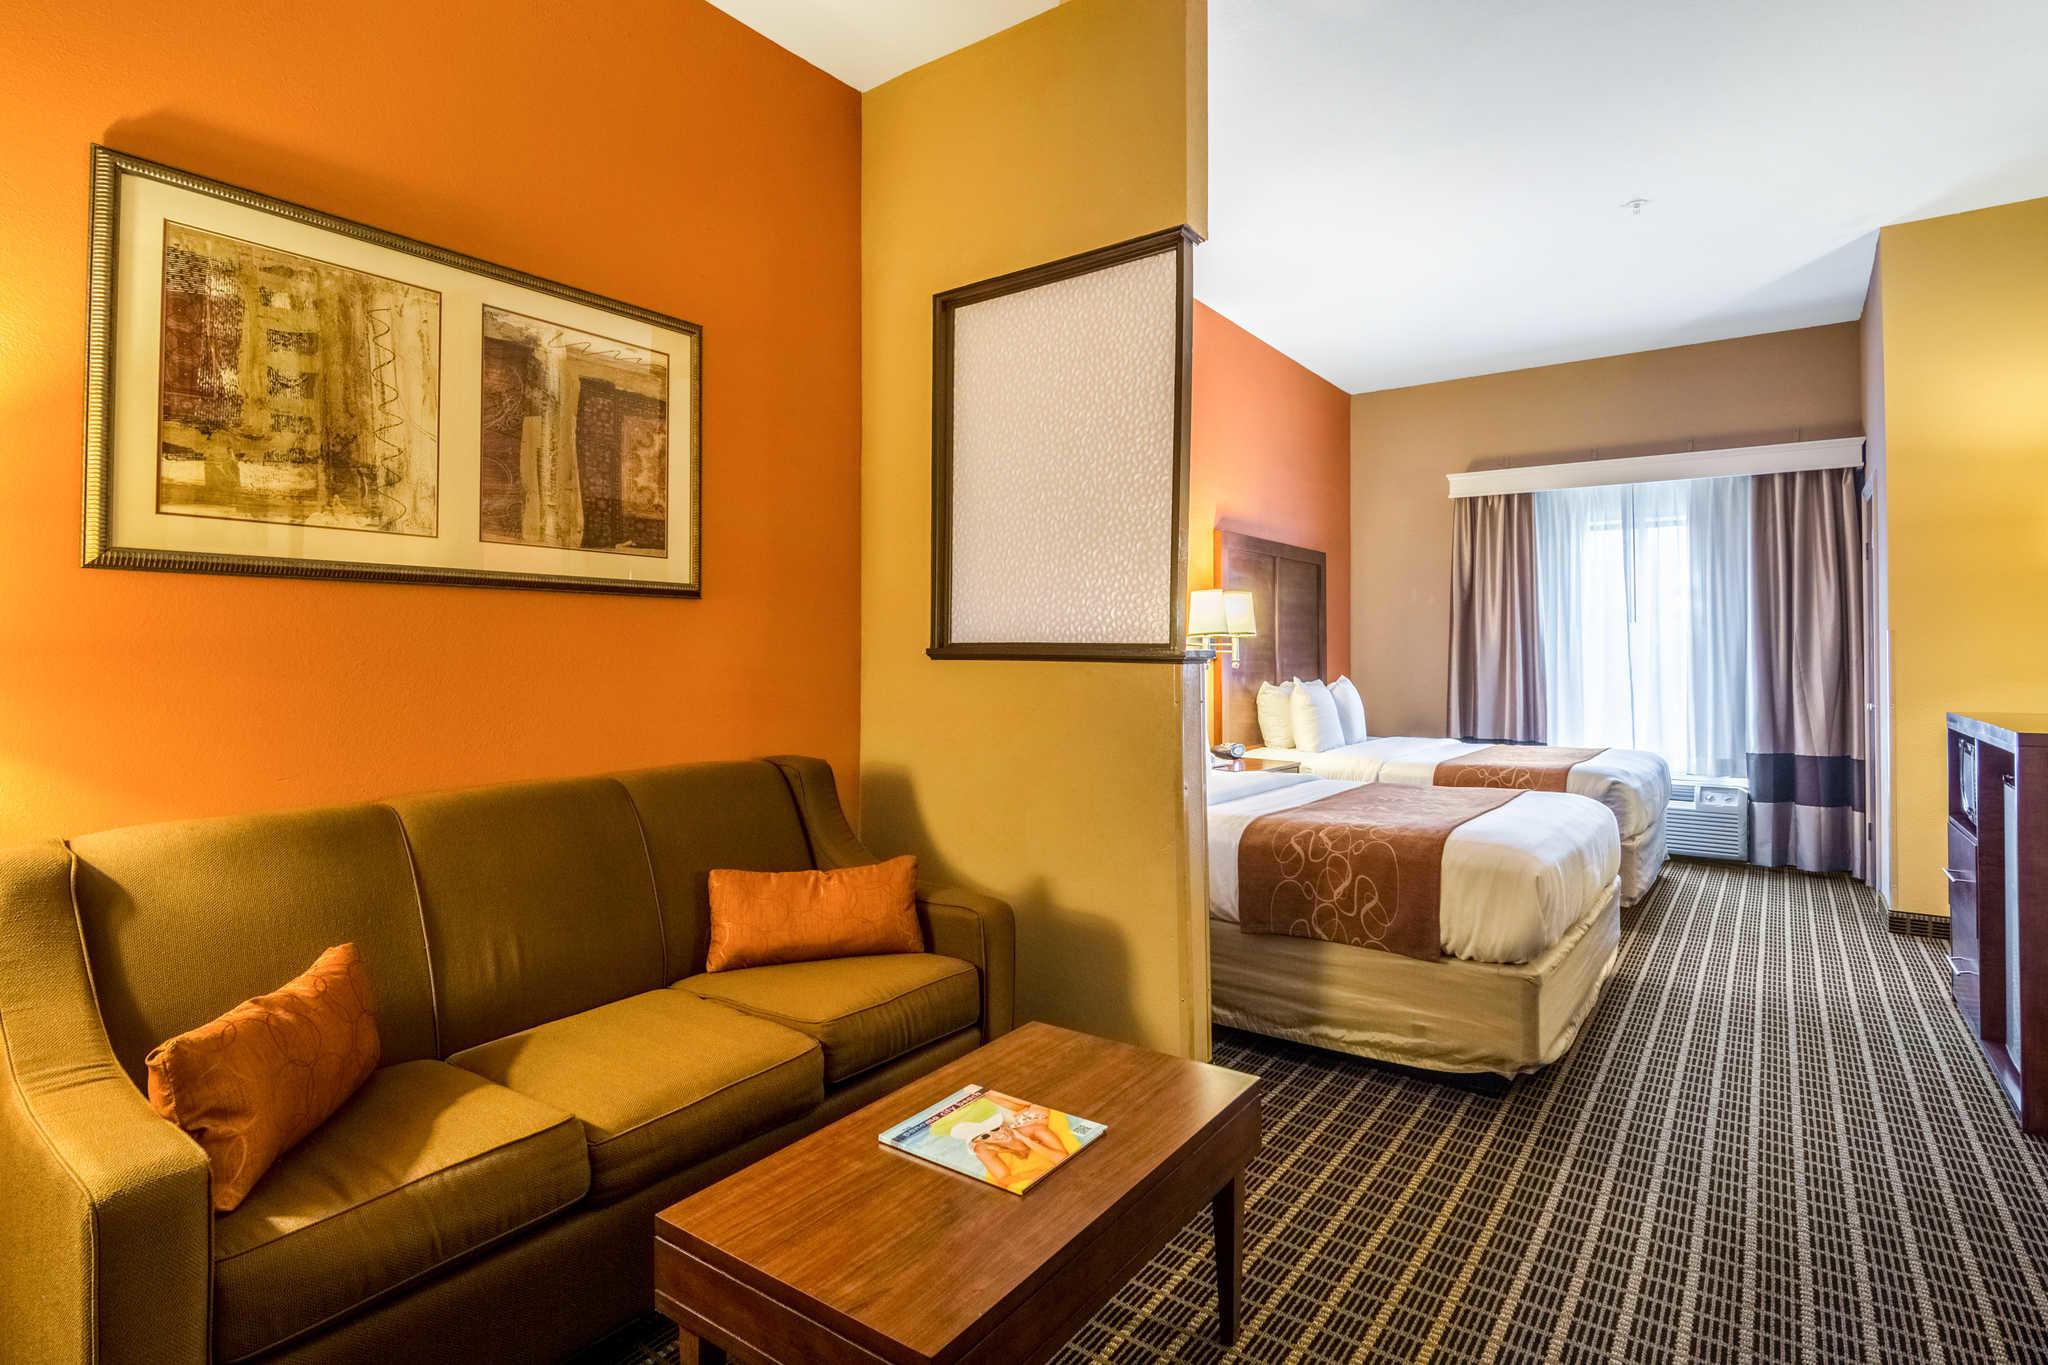 Comfort Suites image 54